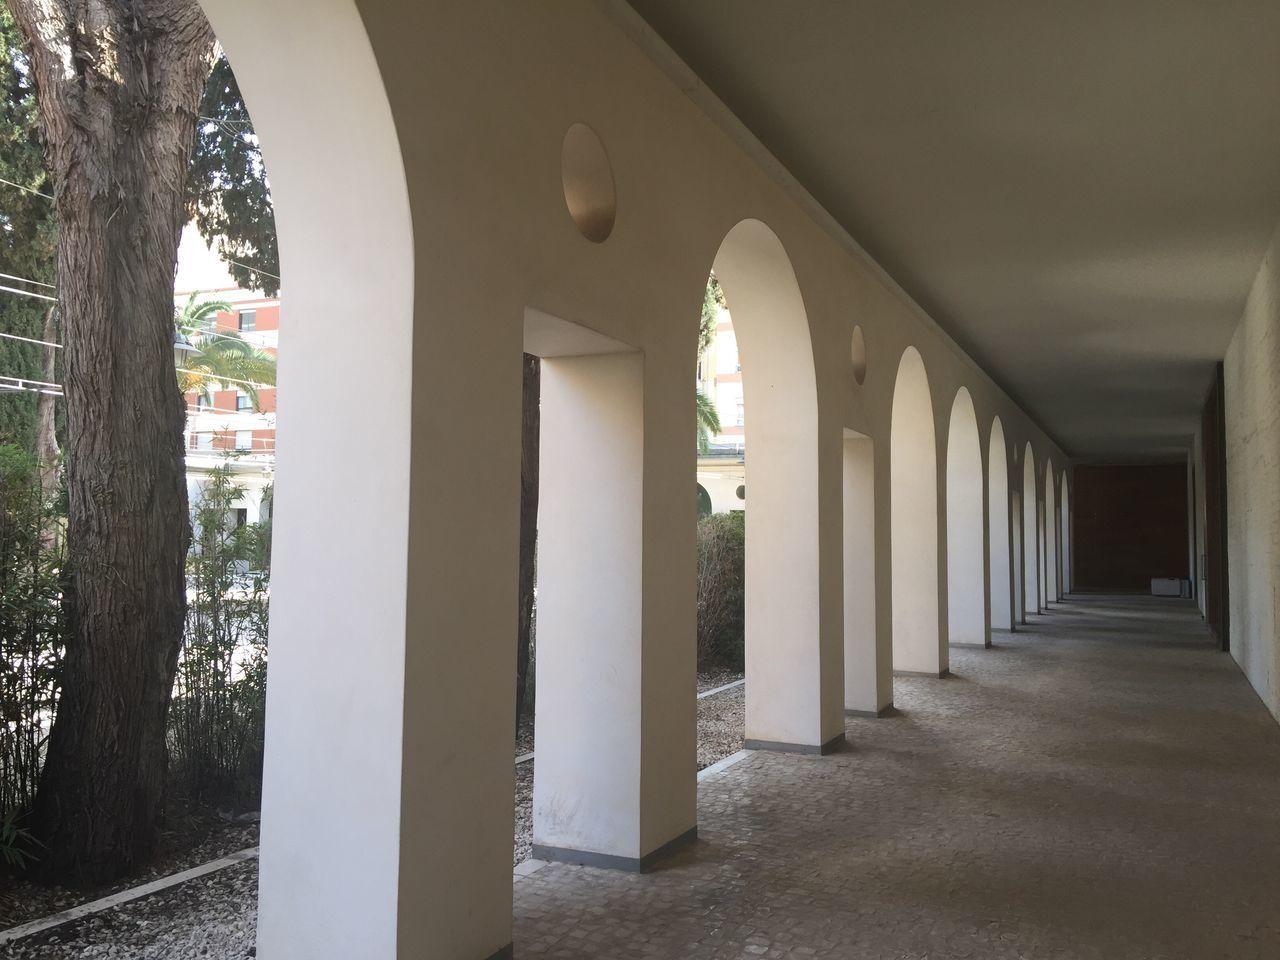 CORRIDOR OF BUILDING WITH COLONNADE